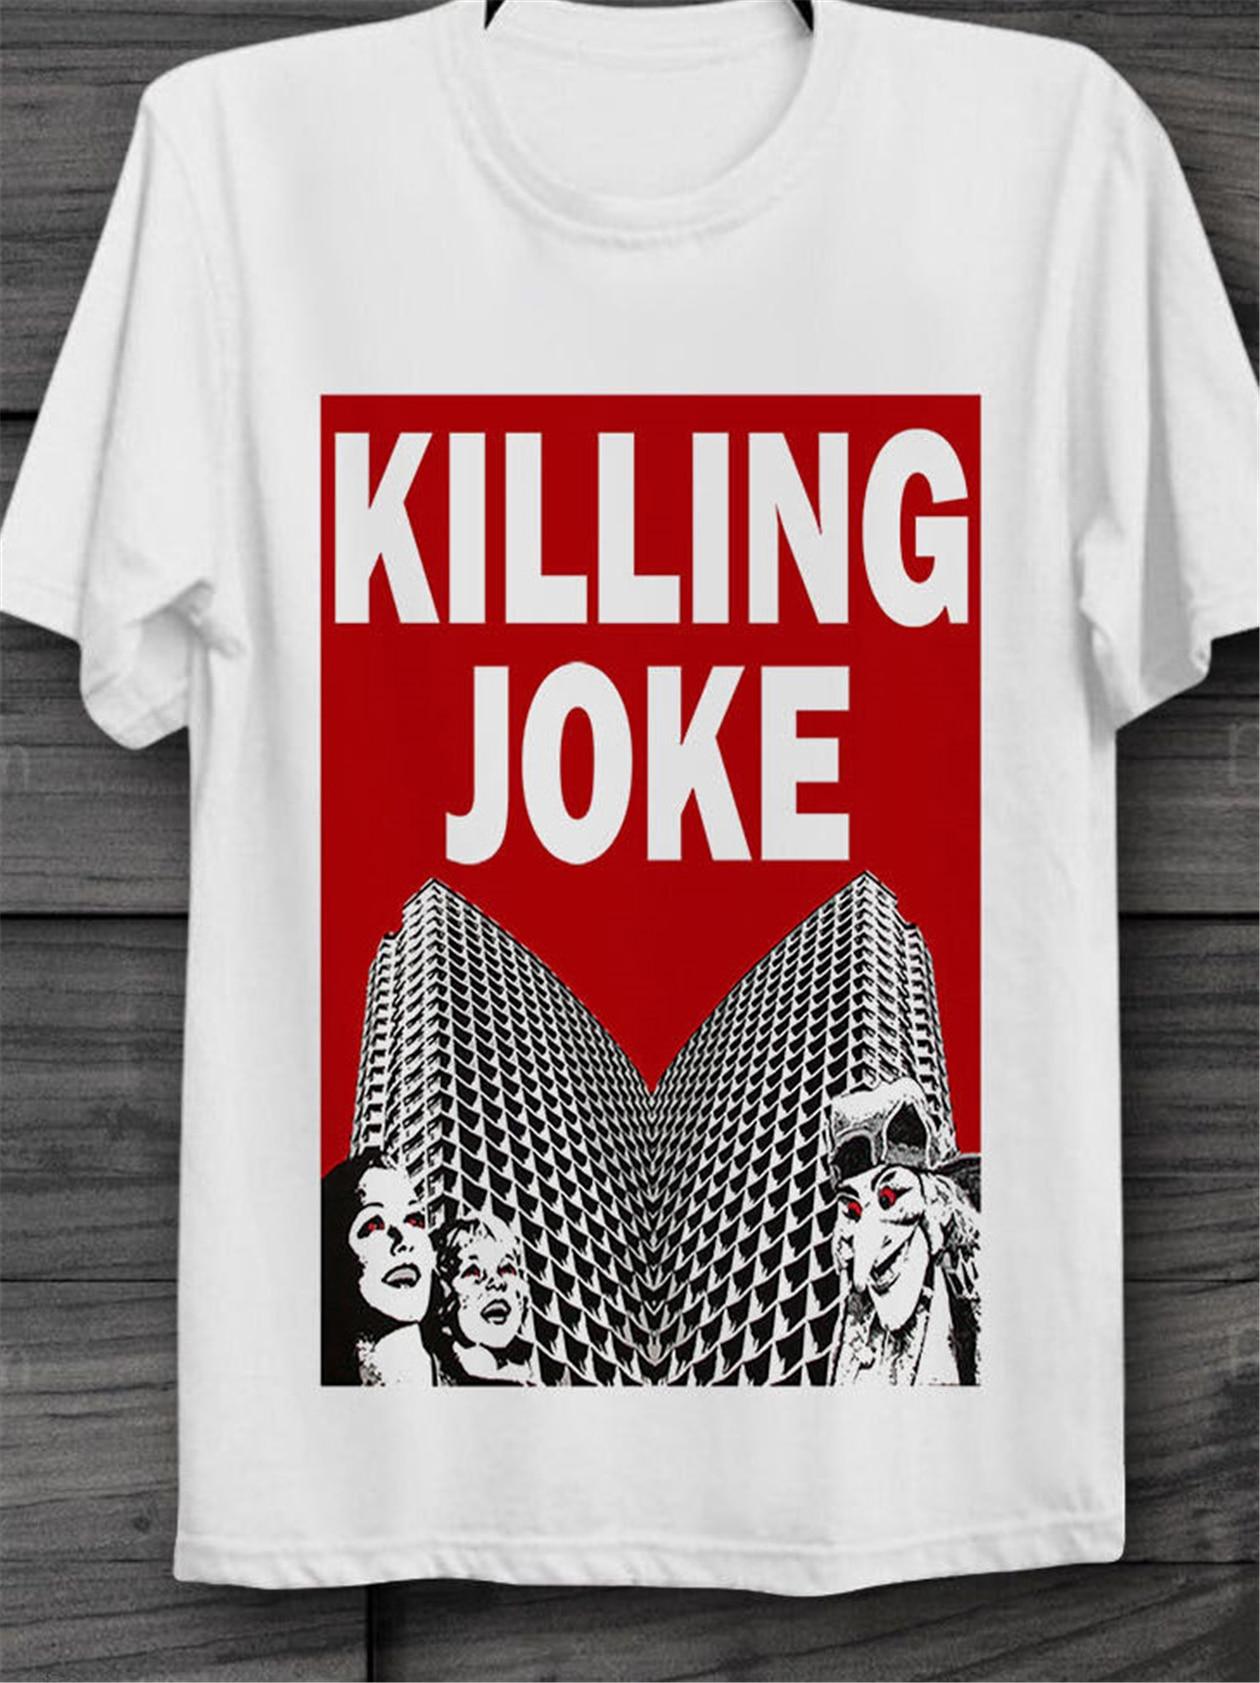 KILLING JOKE Empire Chanson Punk Rock Rétro Vintage Unisexe T Shirt 1772